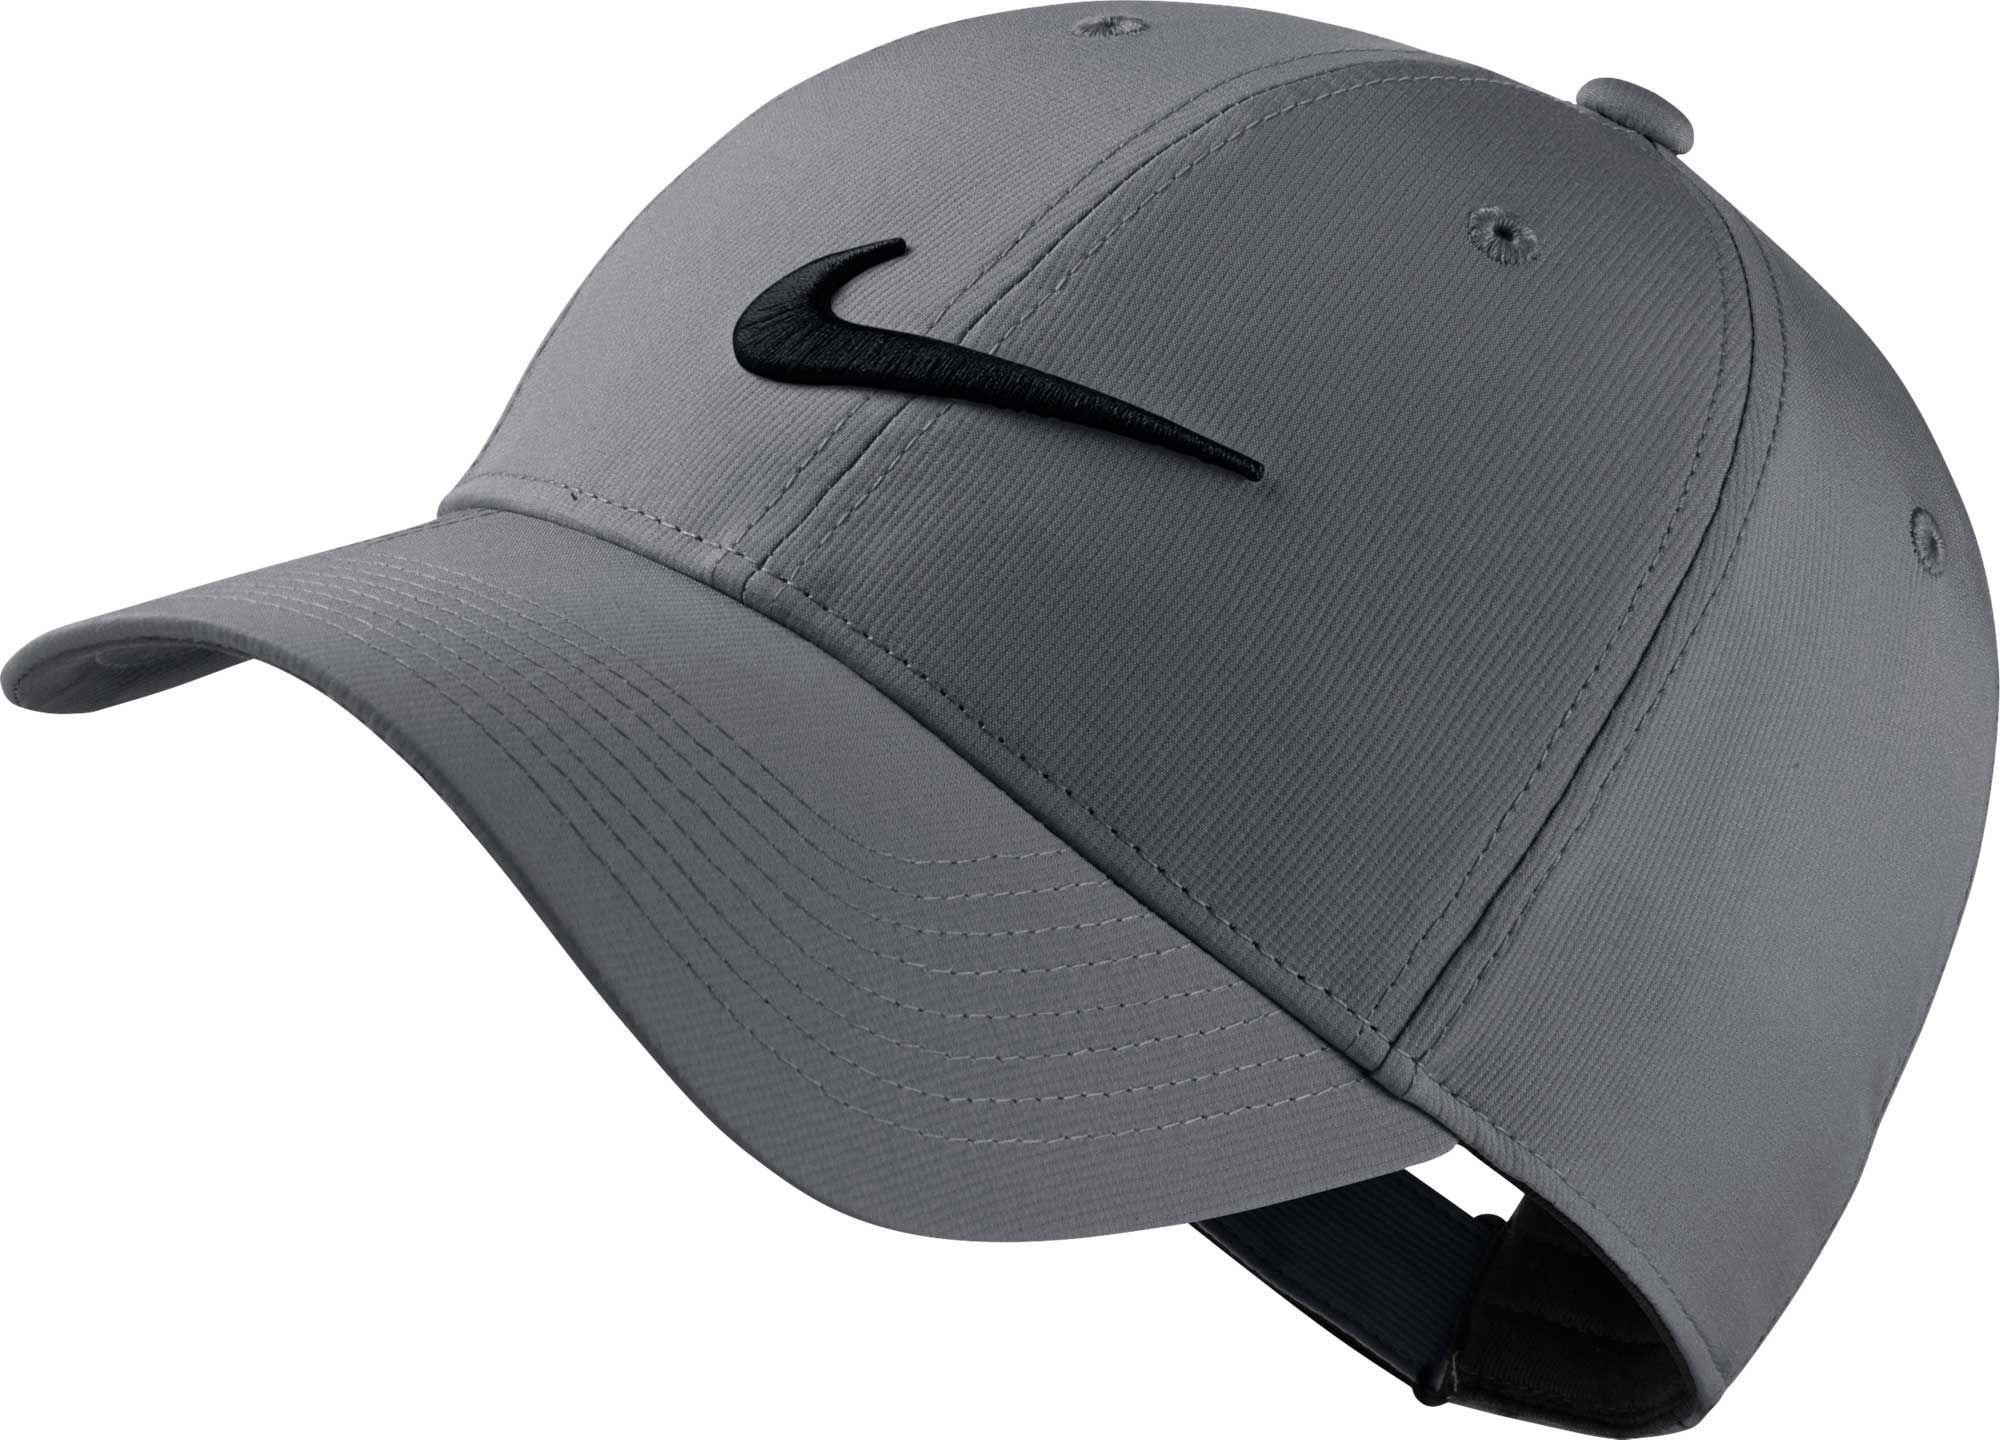 Lyst - Nike 2018 Legacy91 Tech Golf Hat in Gray for Men 879c014e61d0